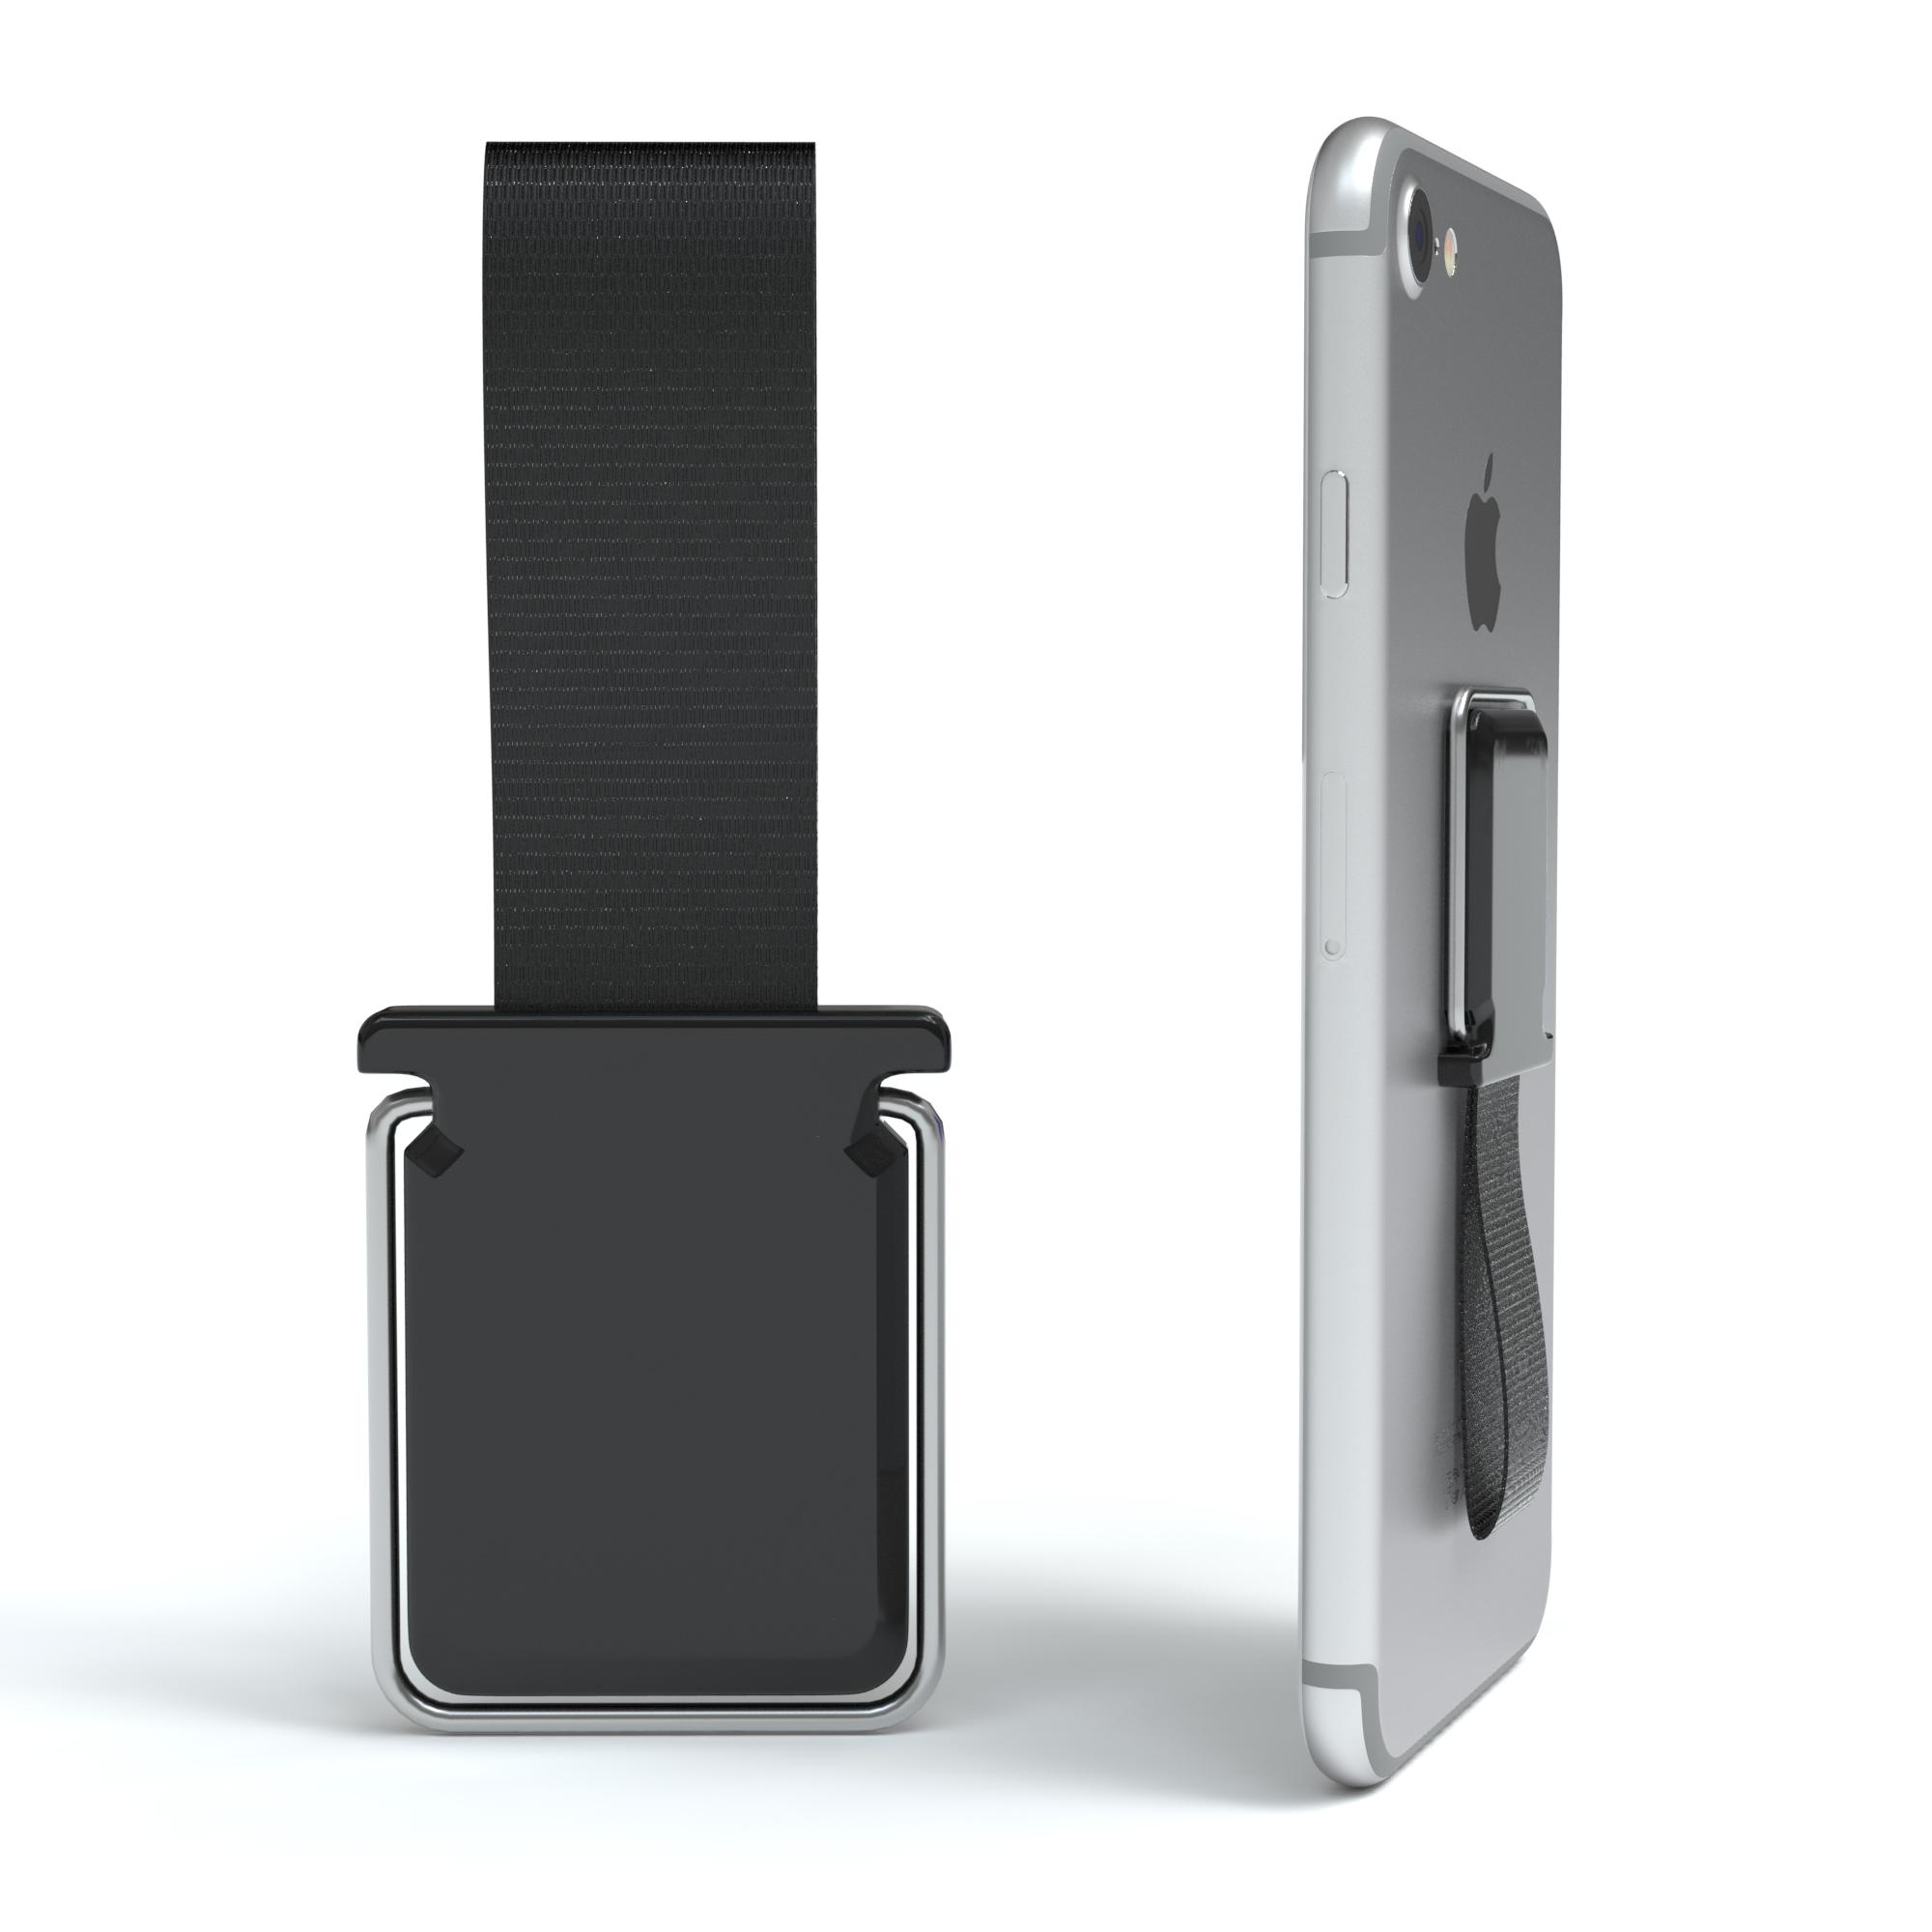 finger halterung handy 2in1 standfunktion fingerschlaufe. Black Bedroom Furniture Sets. Home Design Ideas